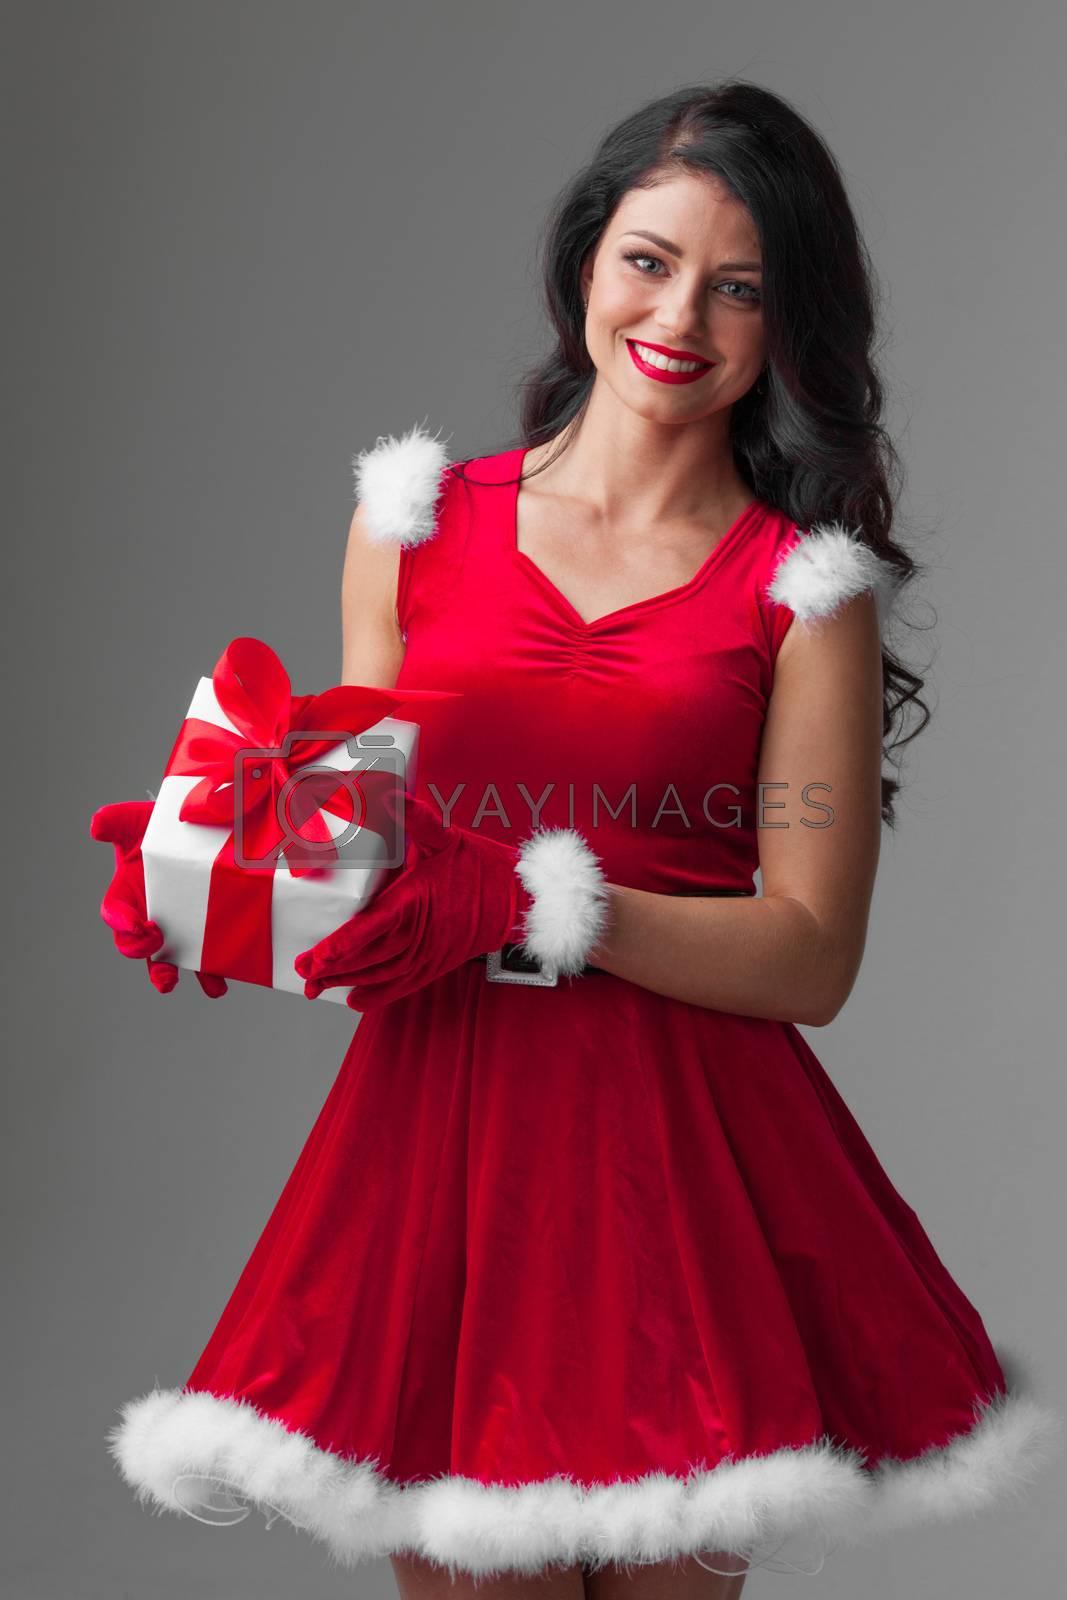 Beautiful young woman in Santa dress celebrating Christmas holding gift box